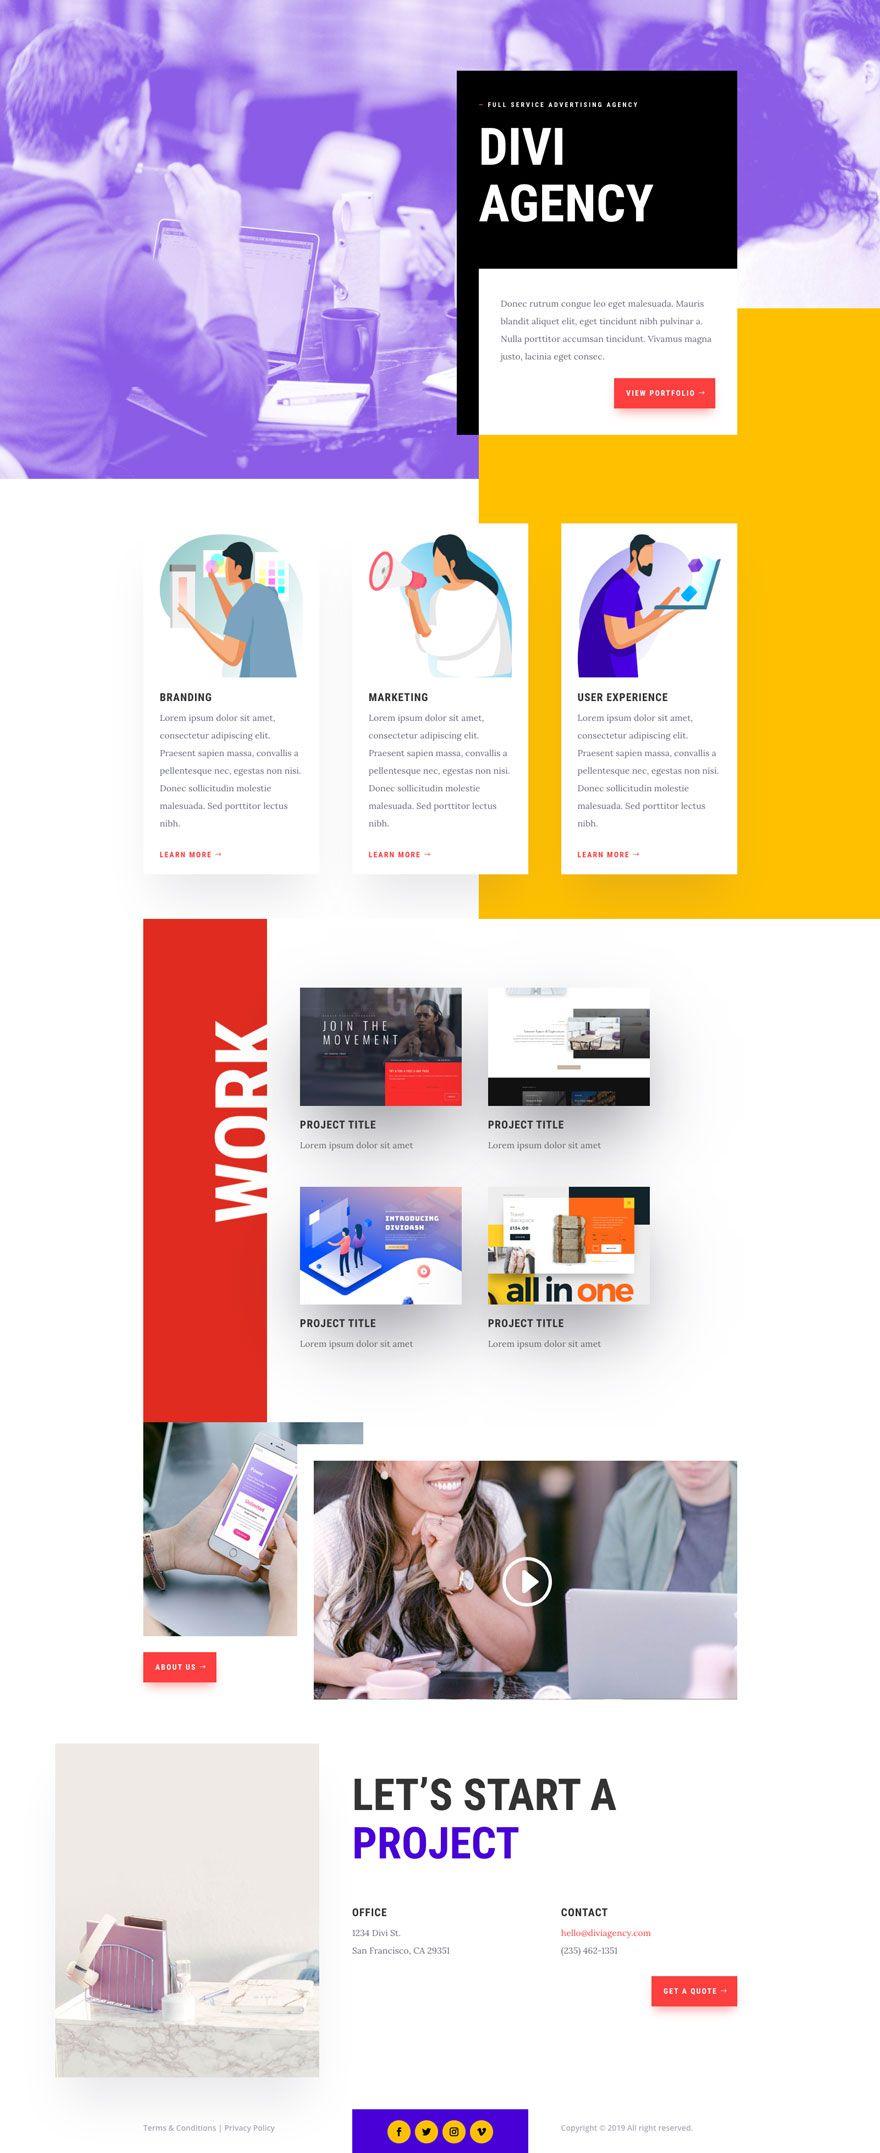 Get A Free Advertising Agency Layout Pack For Divi Agency Website Design Marketing Agency Website Creative Agency Website